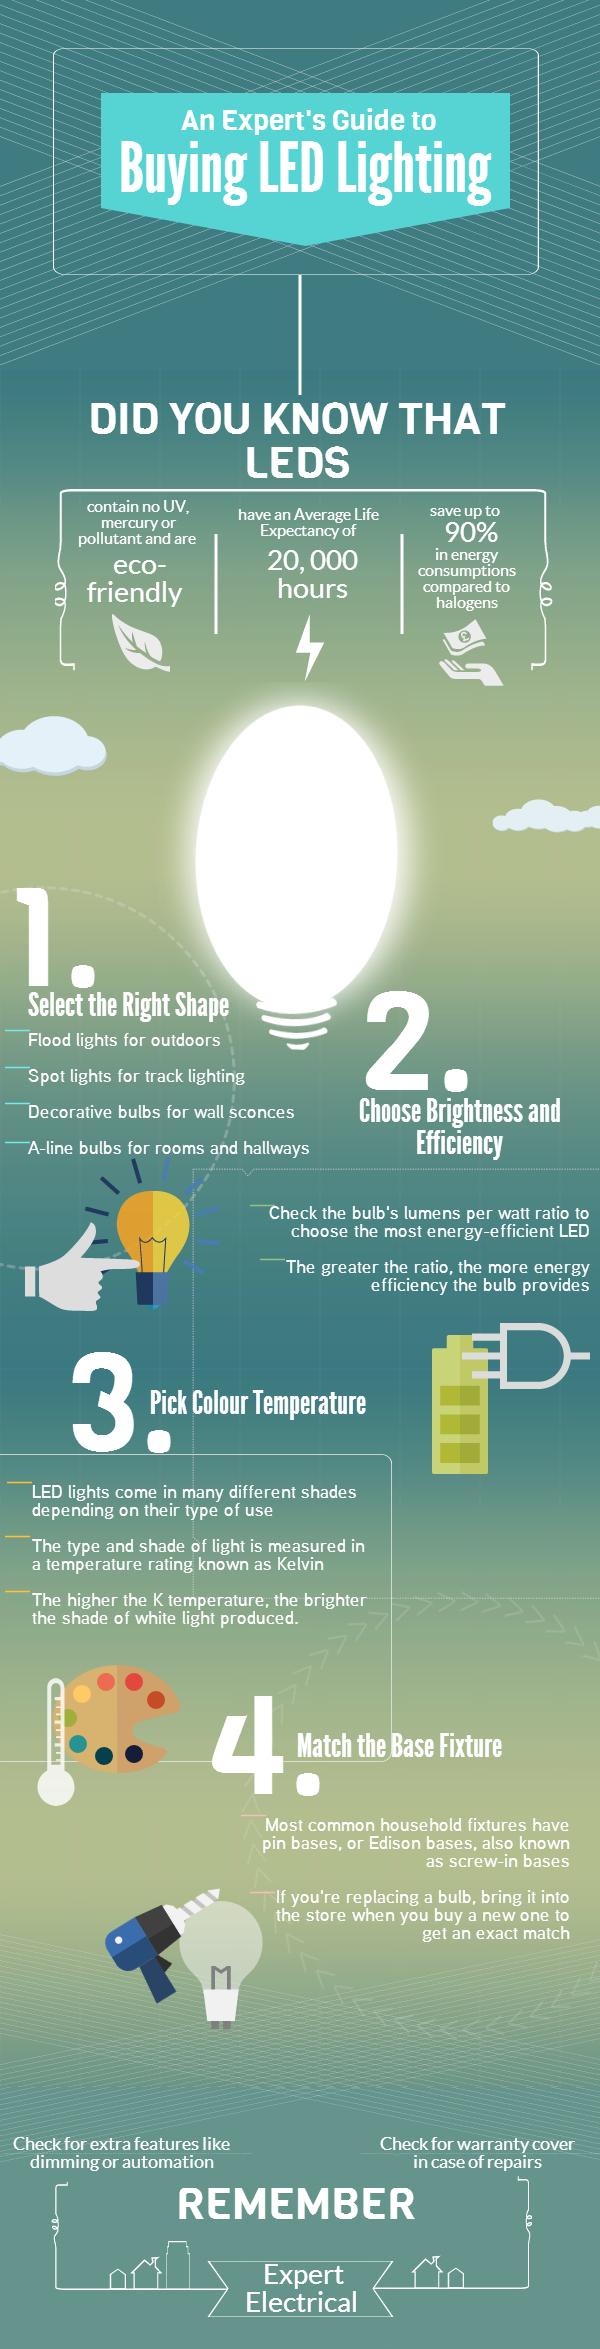 Cost Comparison: LEDs vs Traditional Halogen Lighting